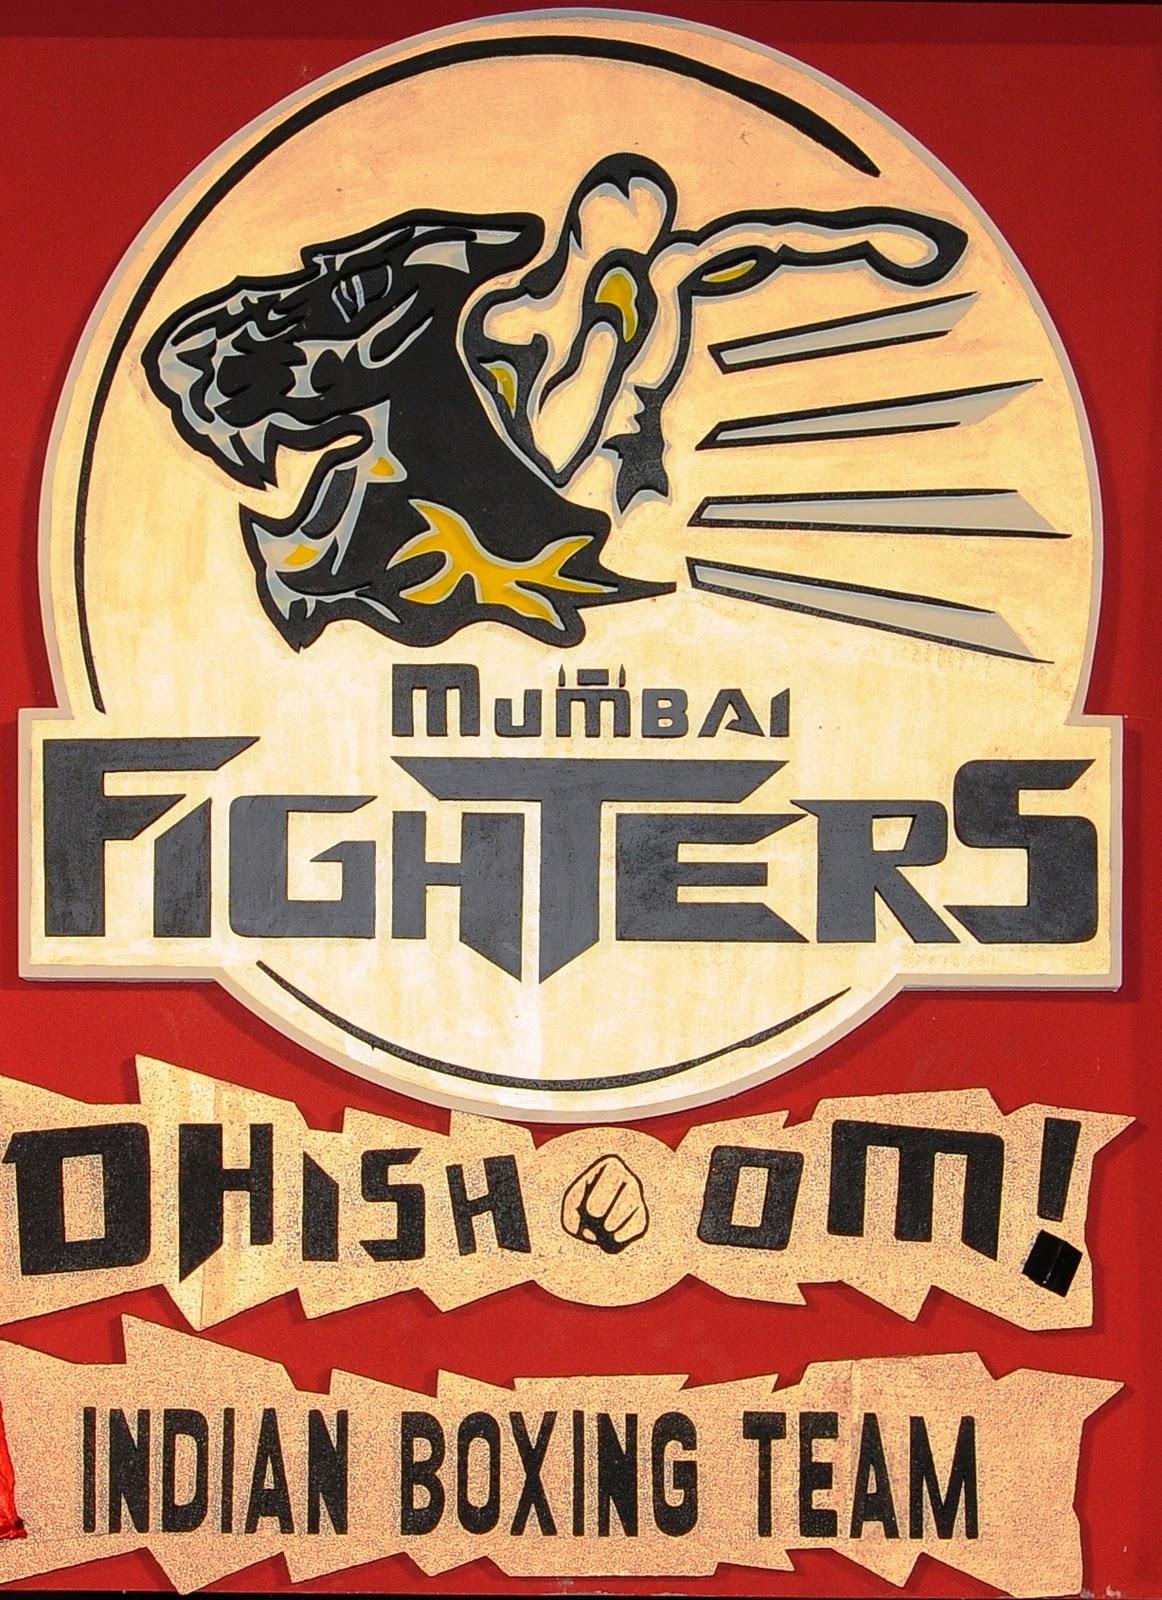 Fighters Team Logo Mumbai Fighters Logo.jpg